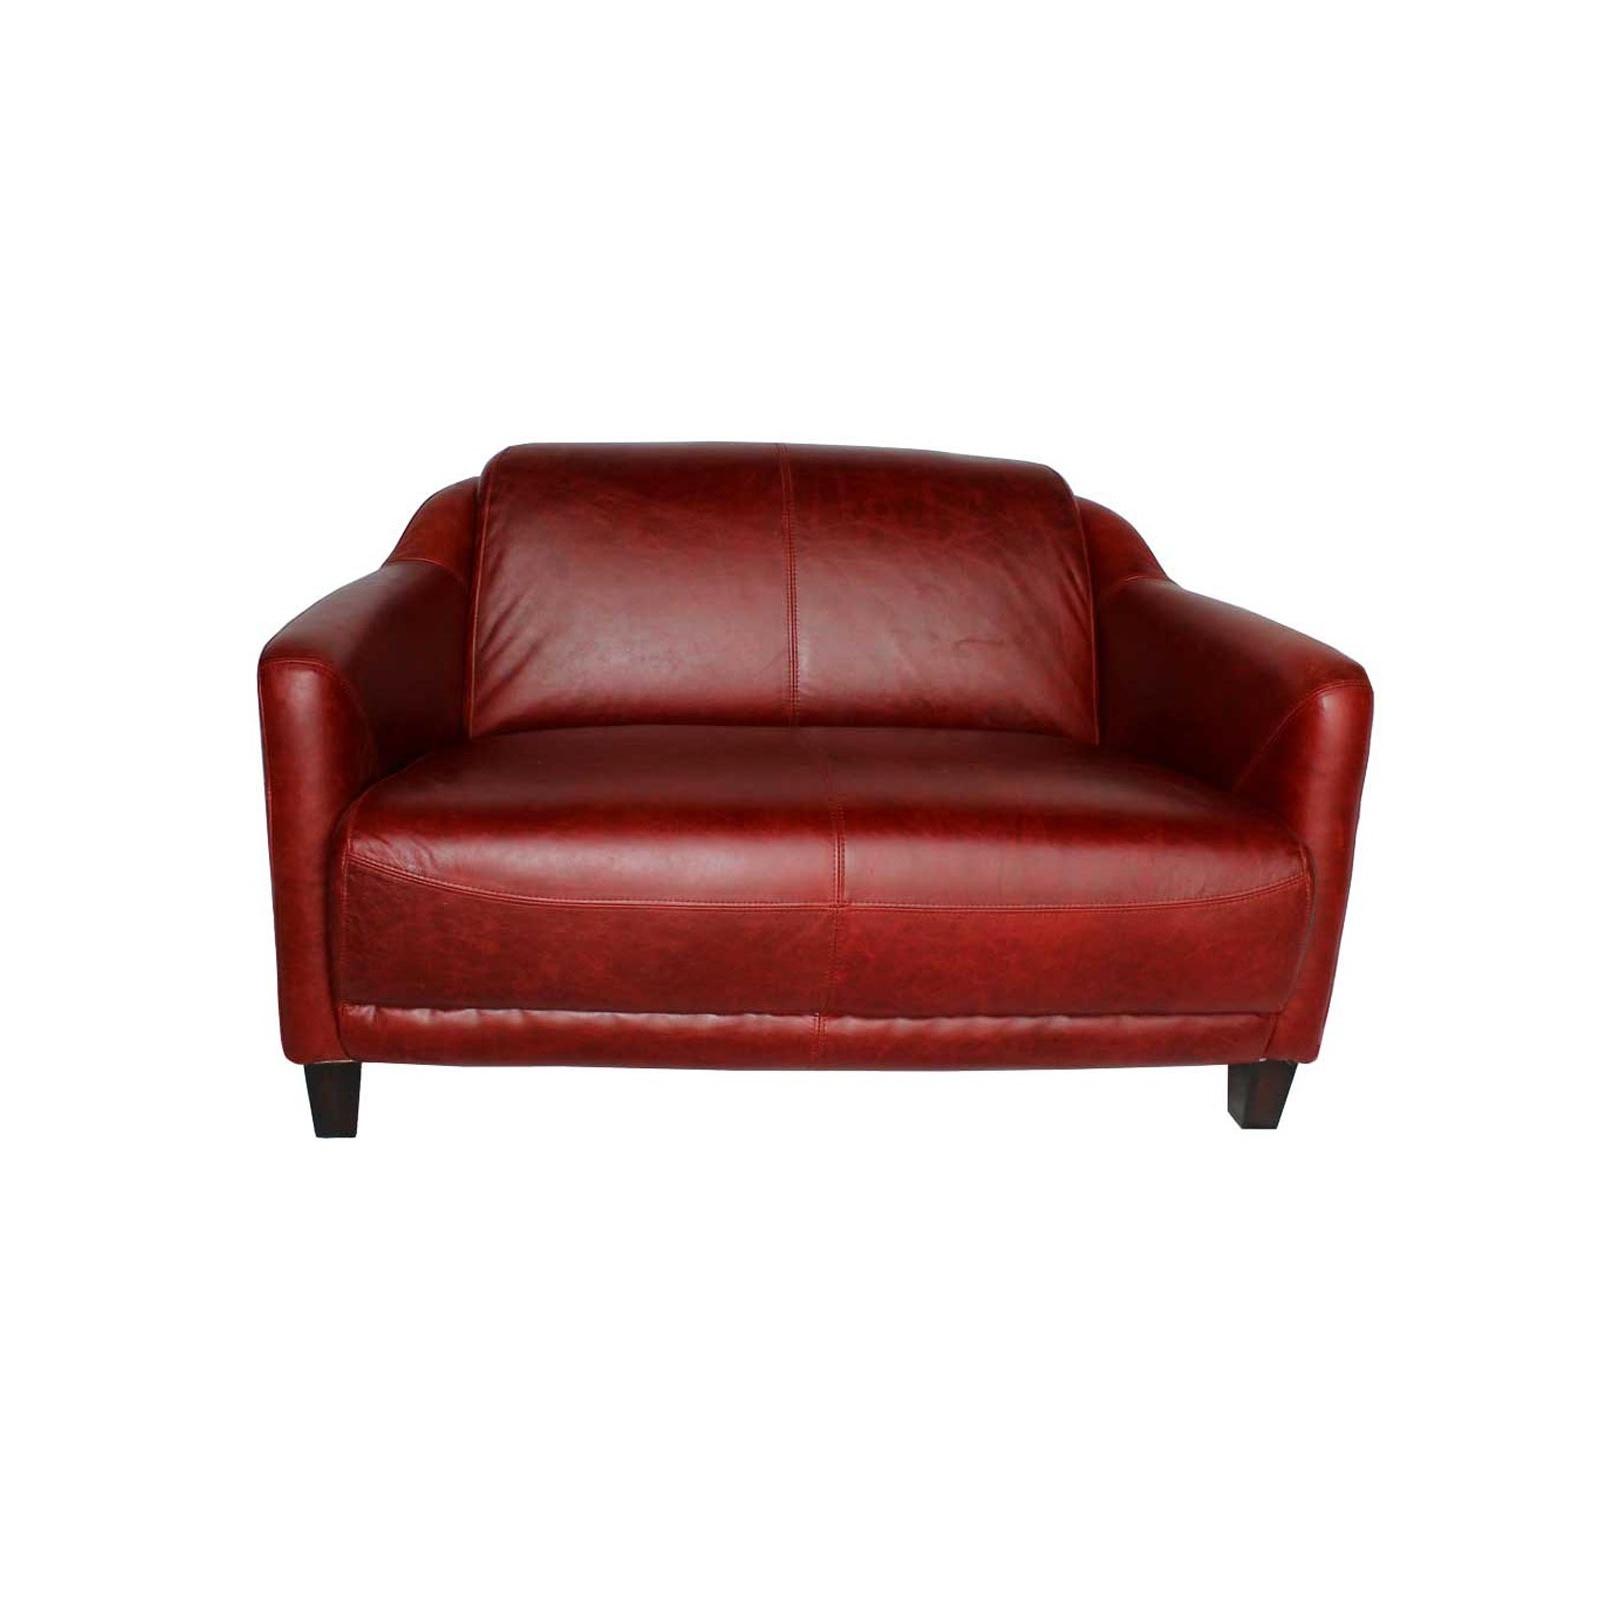 le canap gentleman rouge jp2b d coration. Black Bedroom Furniture Sets. Home Design Ideas